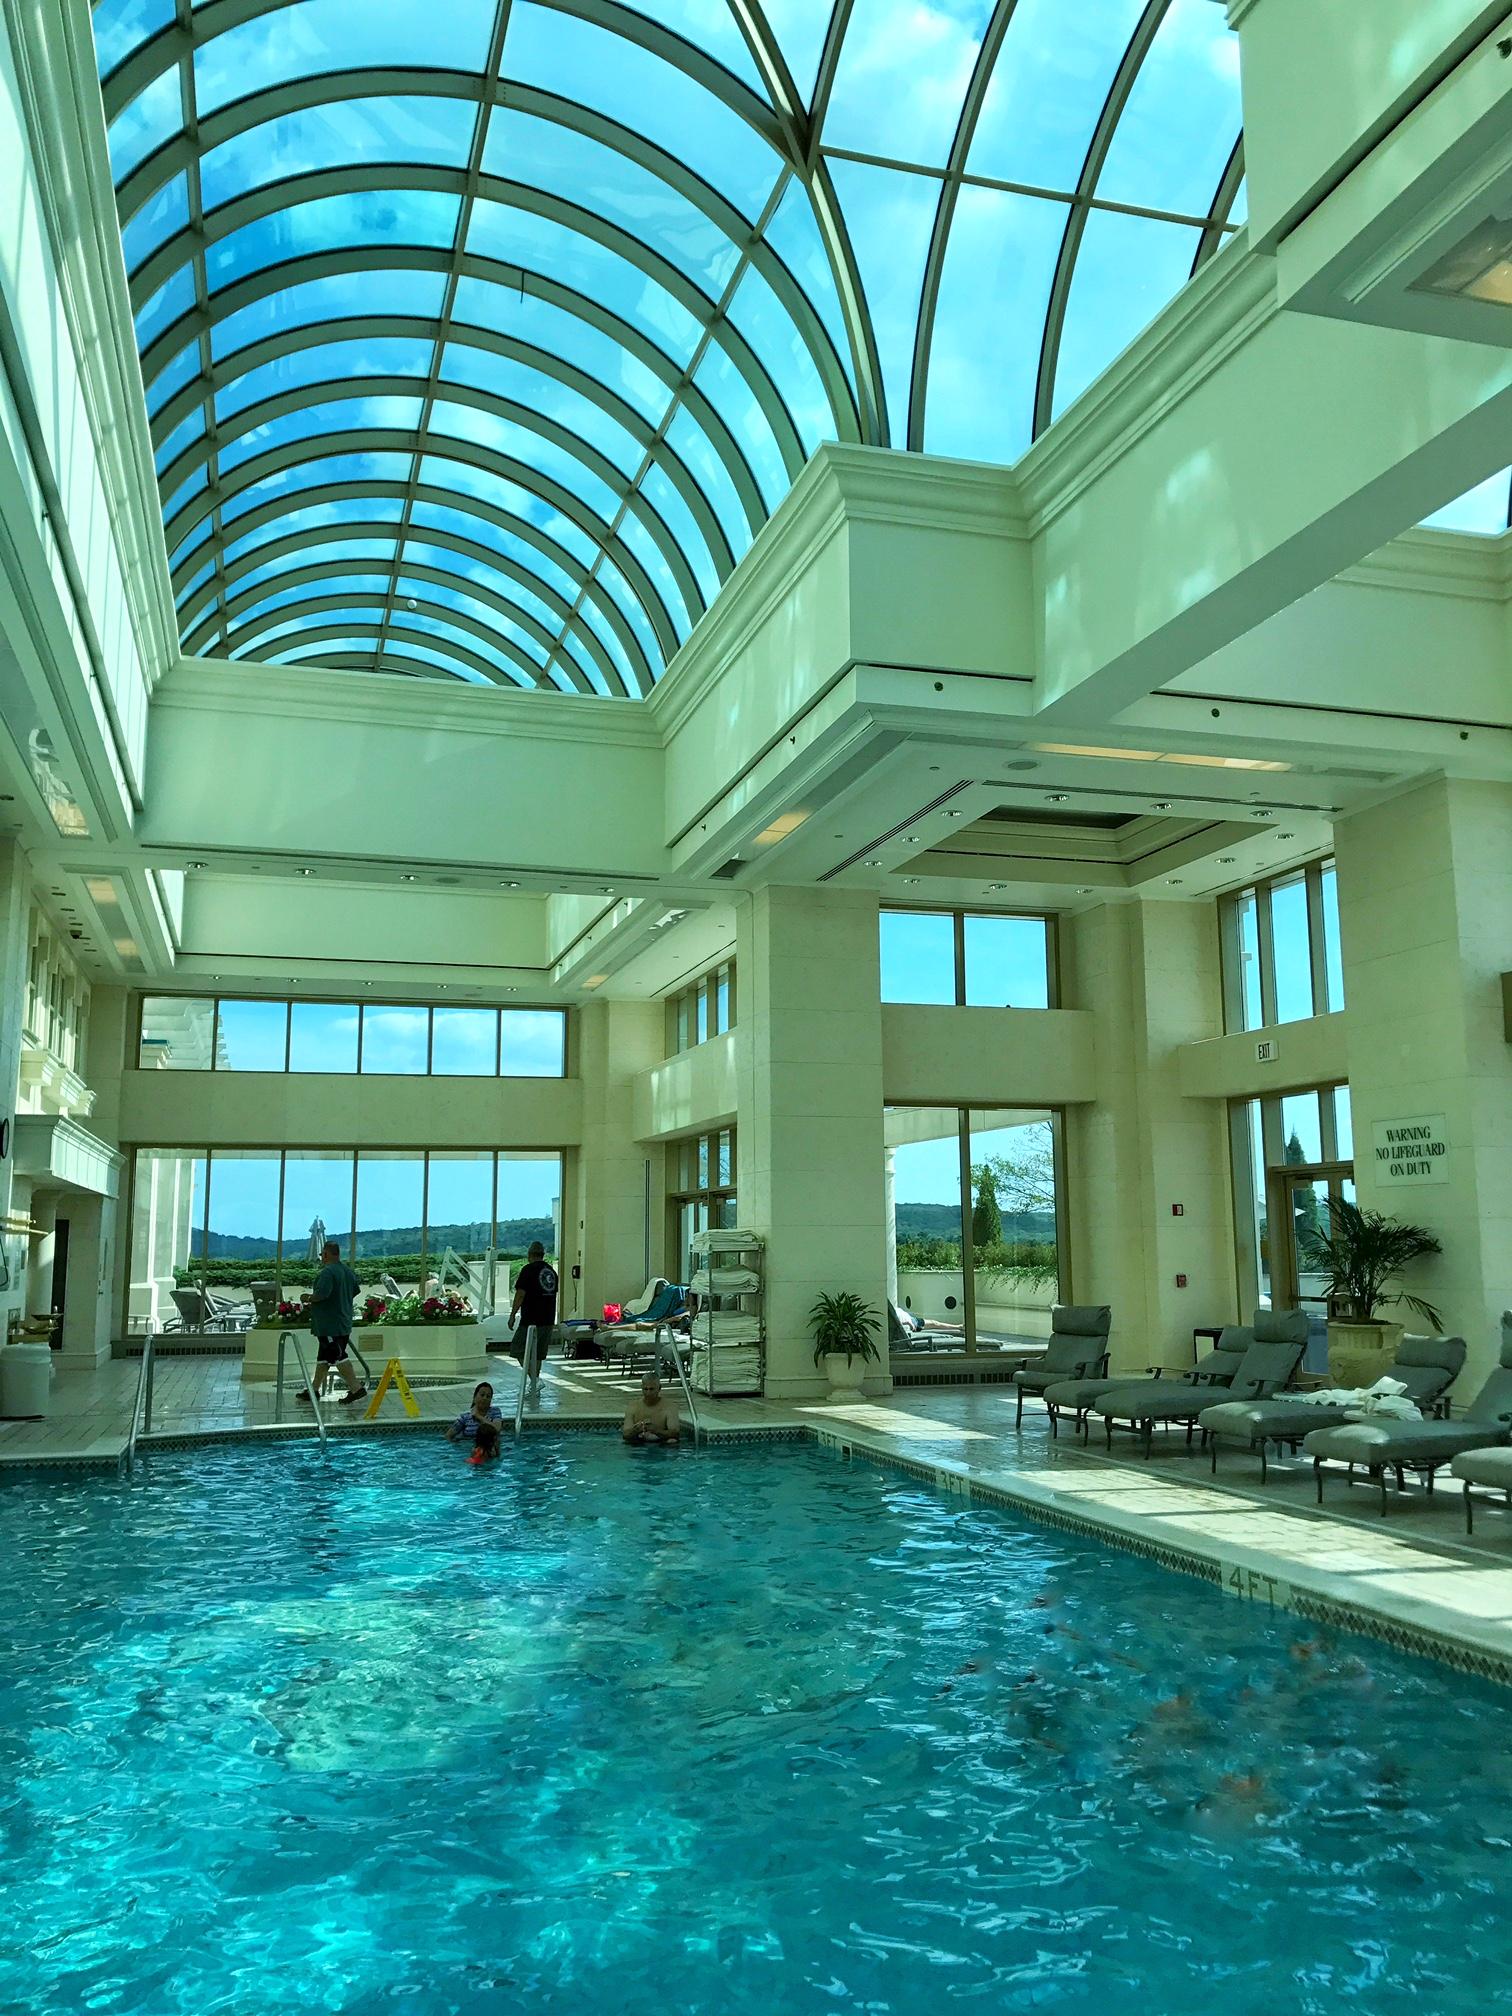 Norwich Spa - Pool